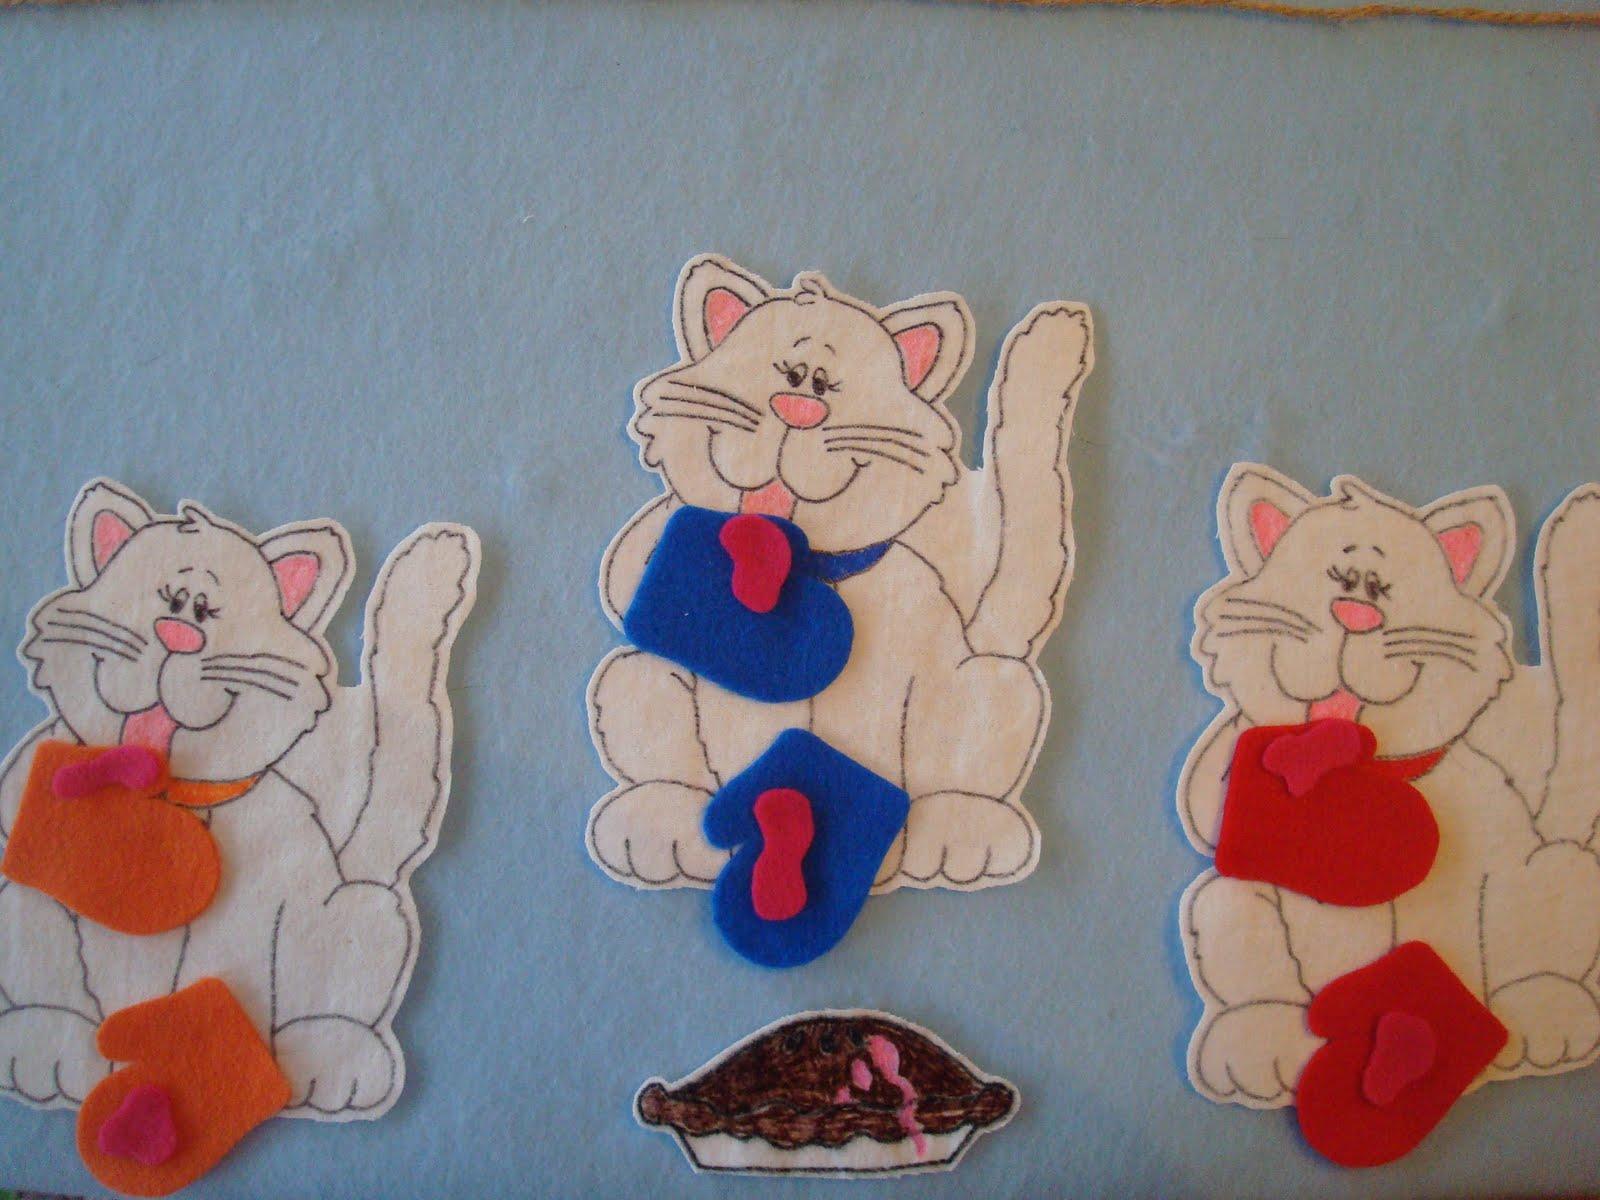 Miss Alison Is Blogging Three Little Kittens